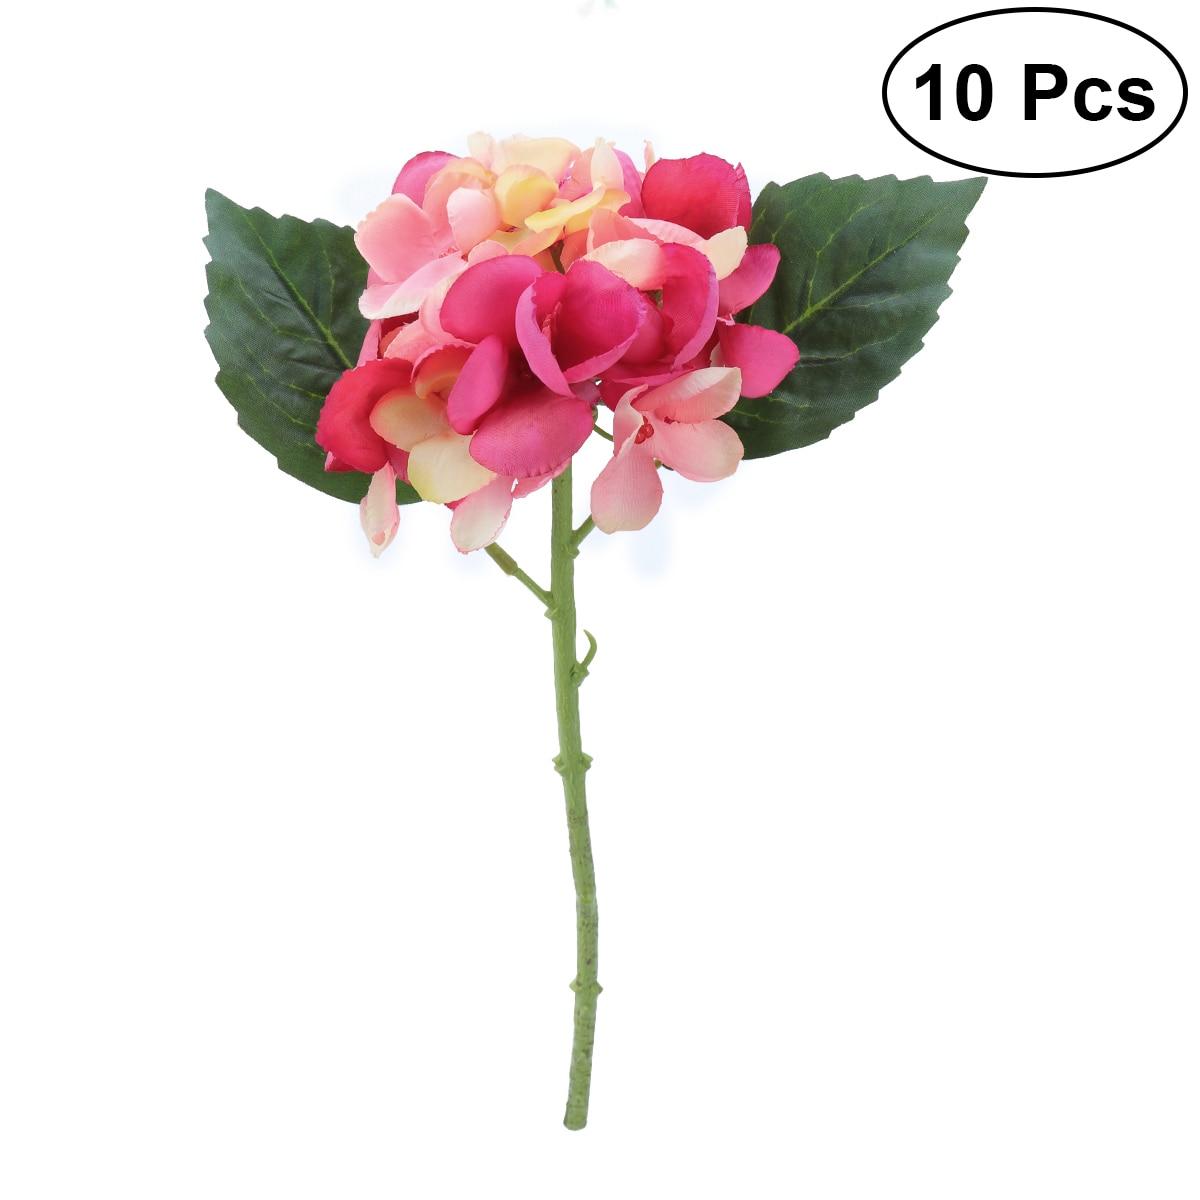 10 Pcs Flower Bunches Bouquet Artificial Silk Single Stem Fake